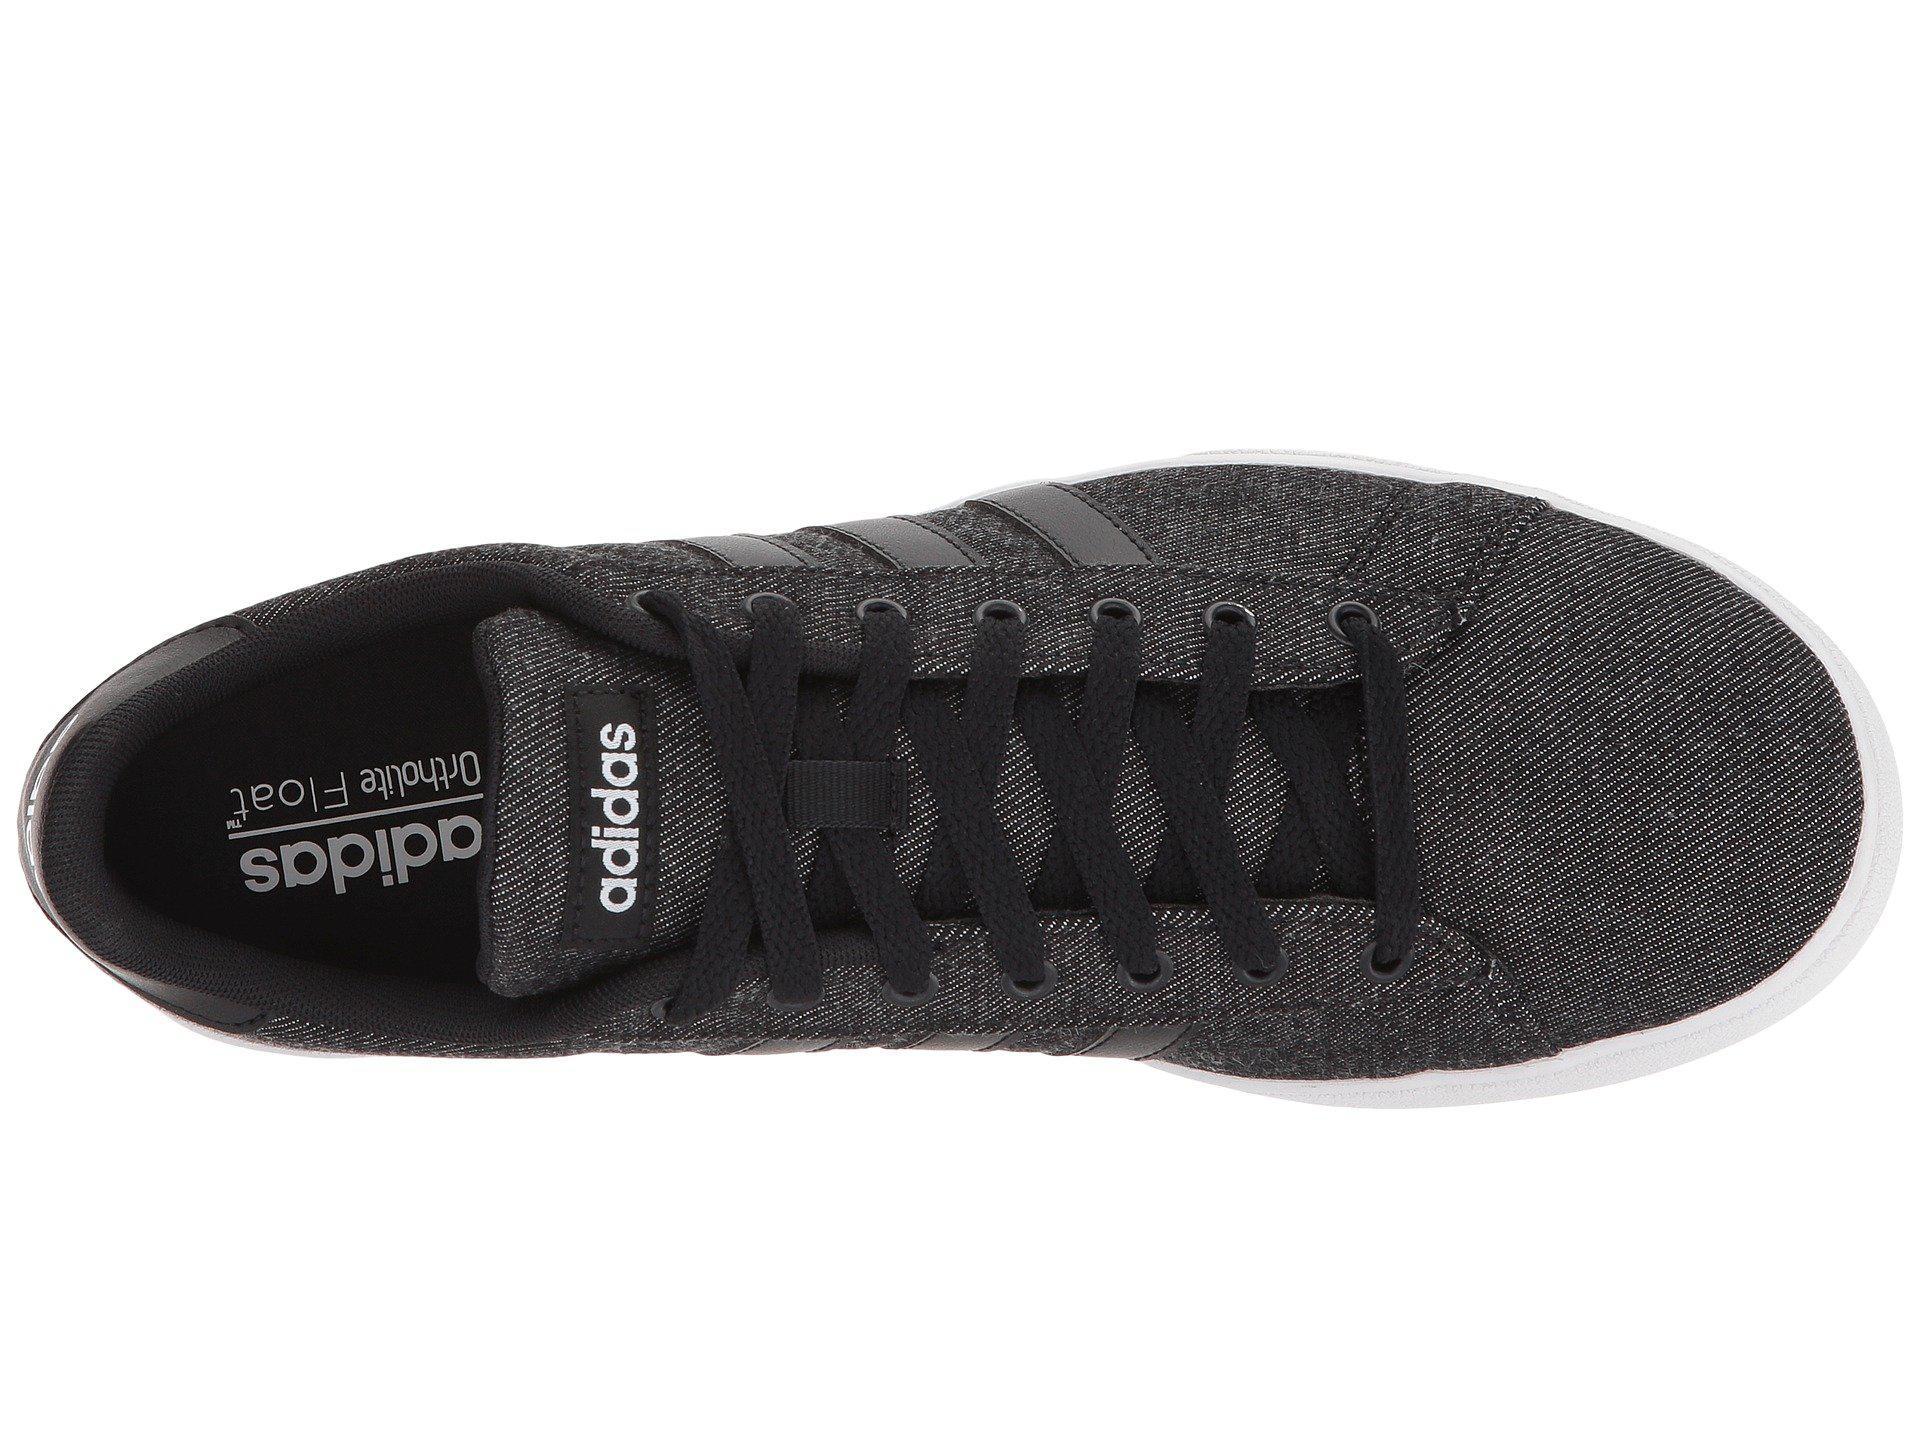 timeless design e3352 85b0f Adidas - Black Daily 2.0 for Men - Lyst. View fullscreen